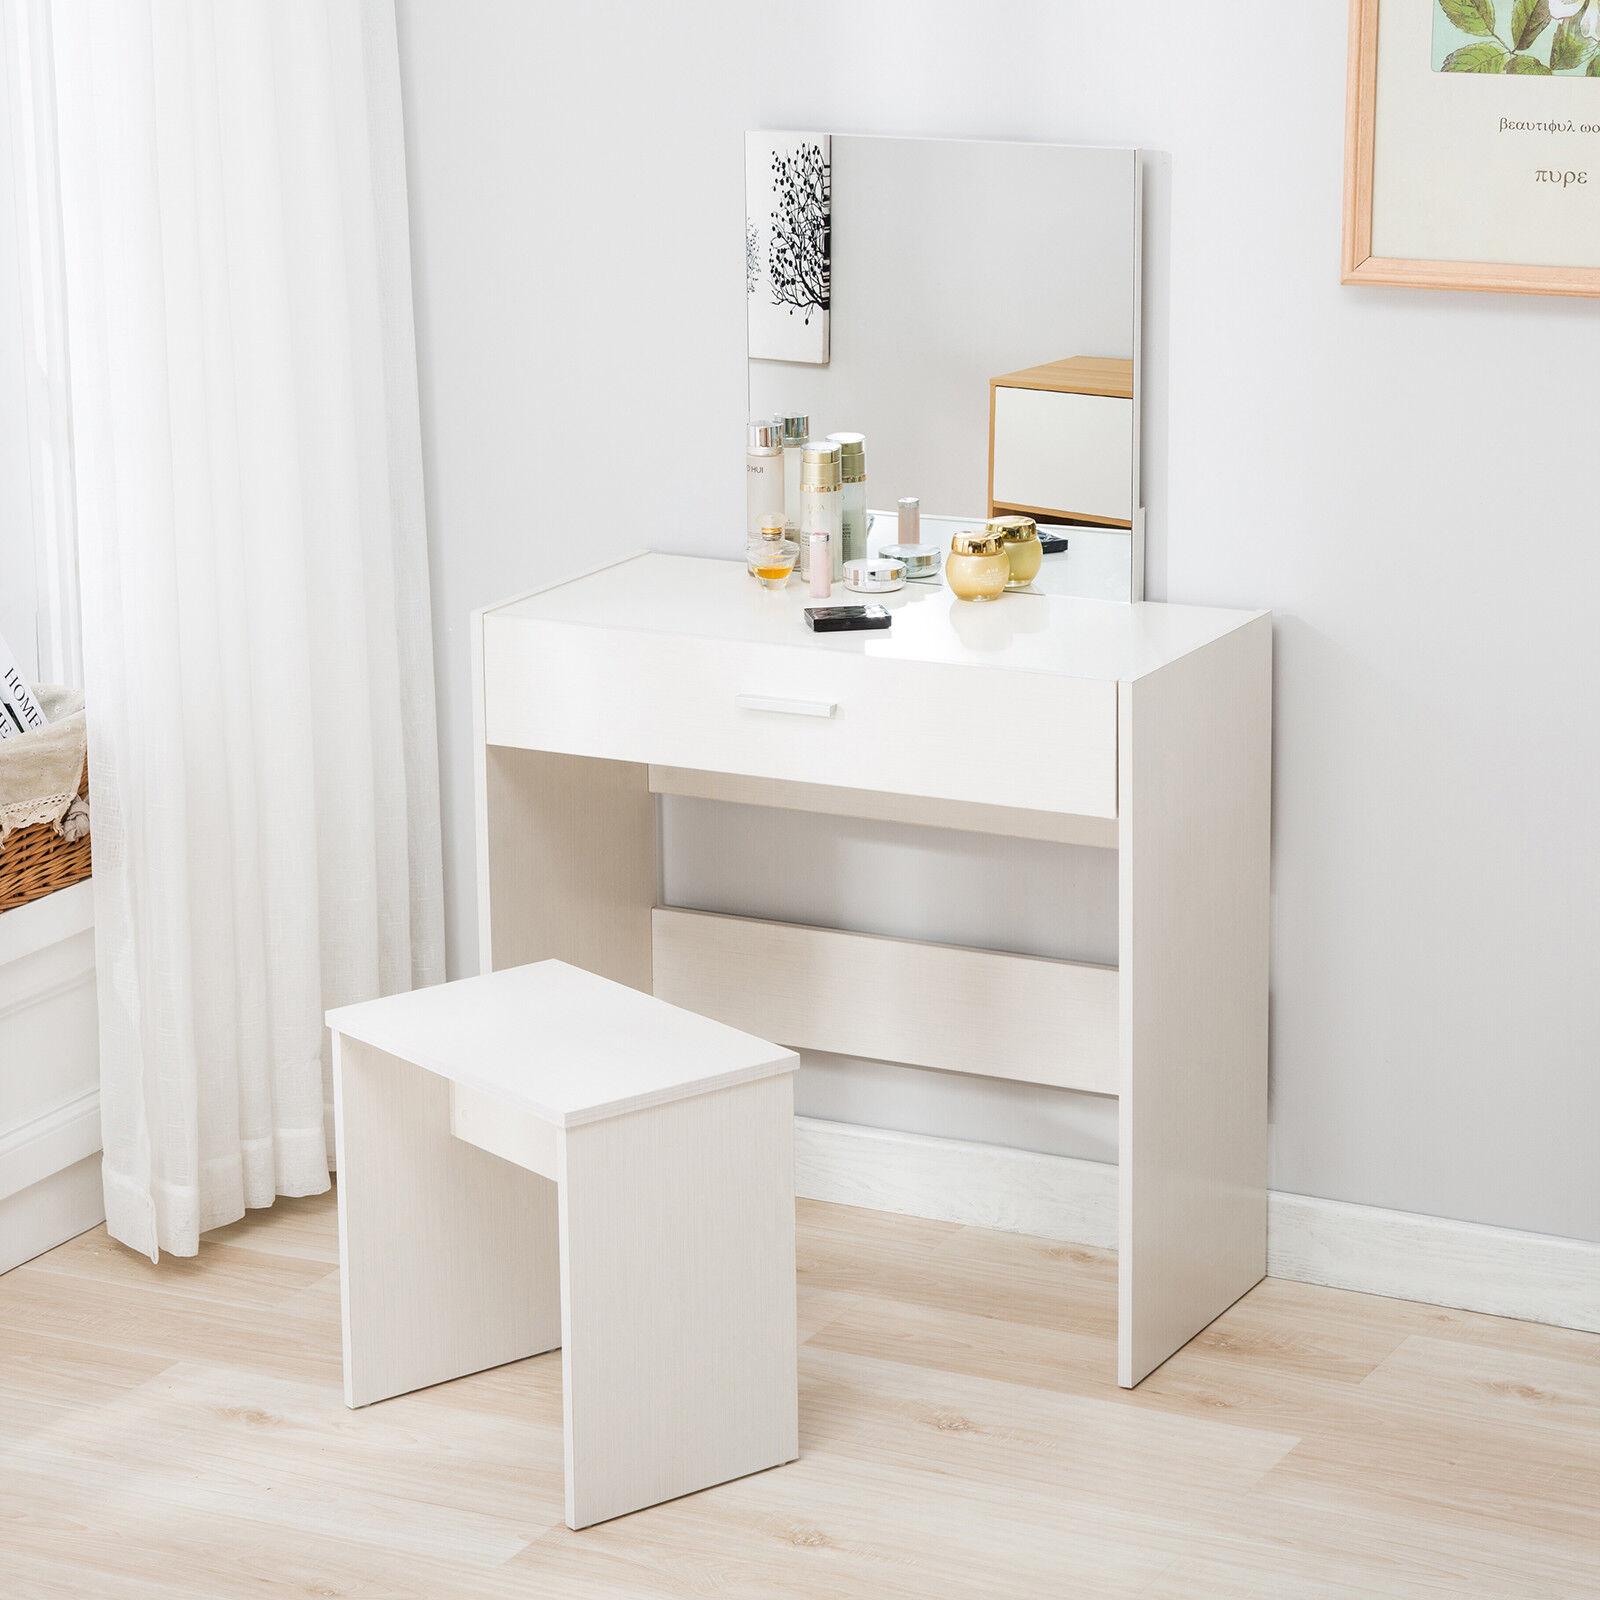 Superbe Vanity White Dressing Table And Stool Set Makeup Dresser Desk W/Mirror  Drawer